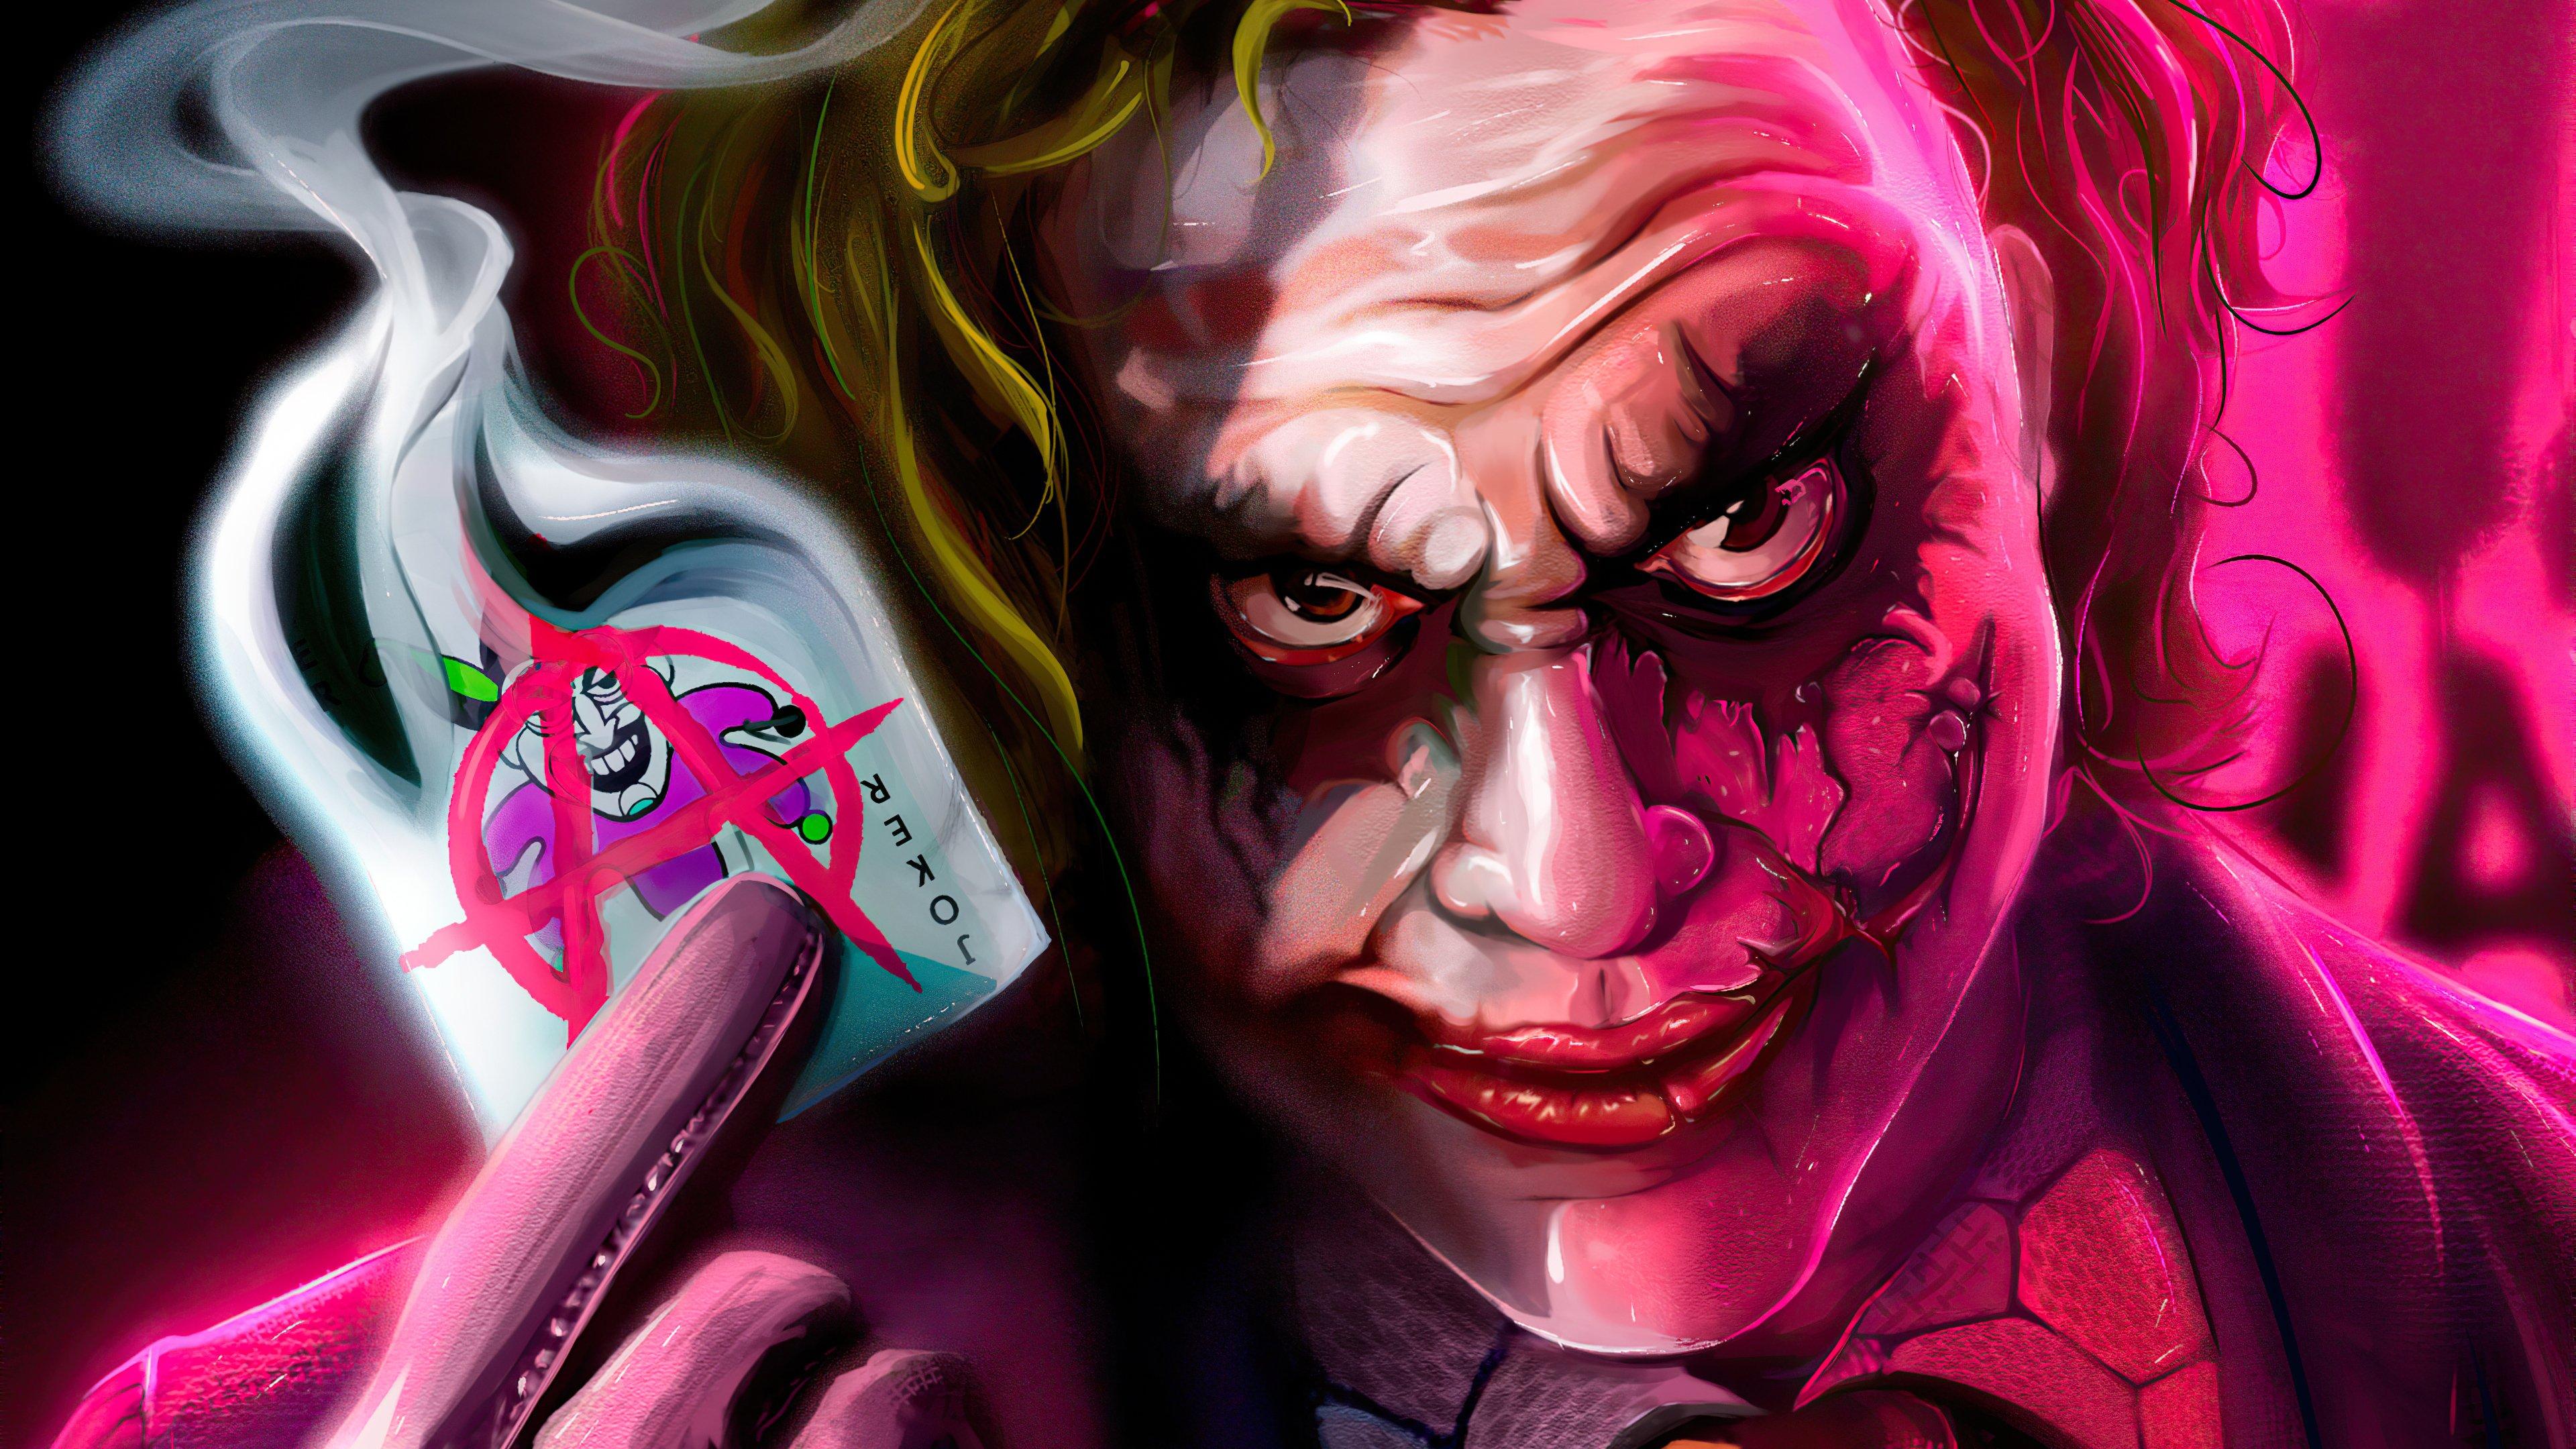 Wallpaper Joker with anarchist card